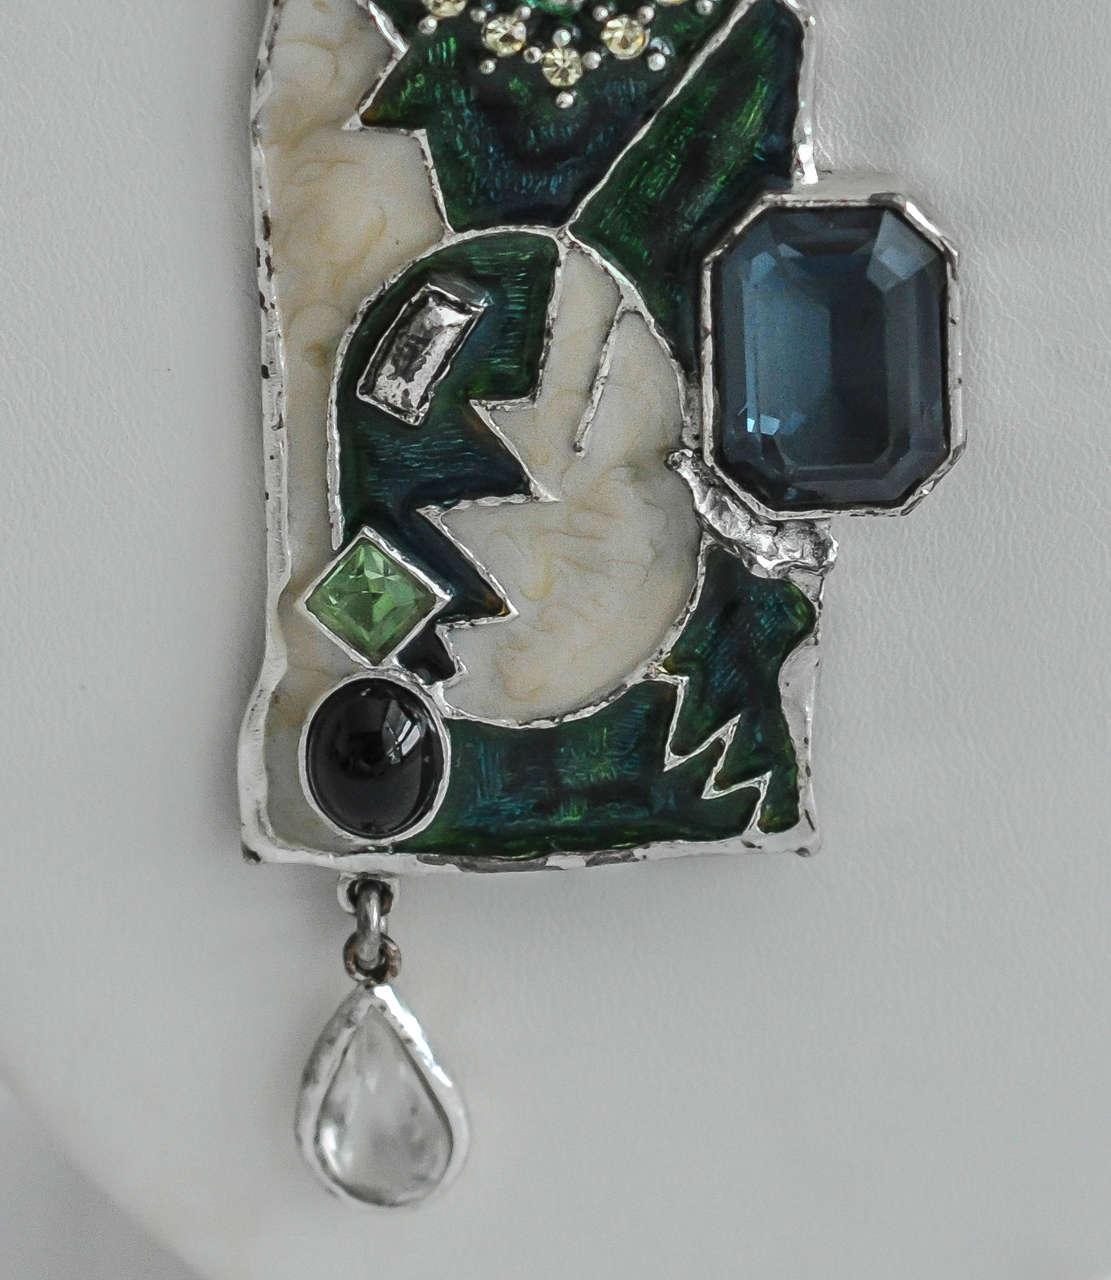 1990s Lacroix Modern Tribalist Necklace For Sale 1